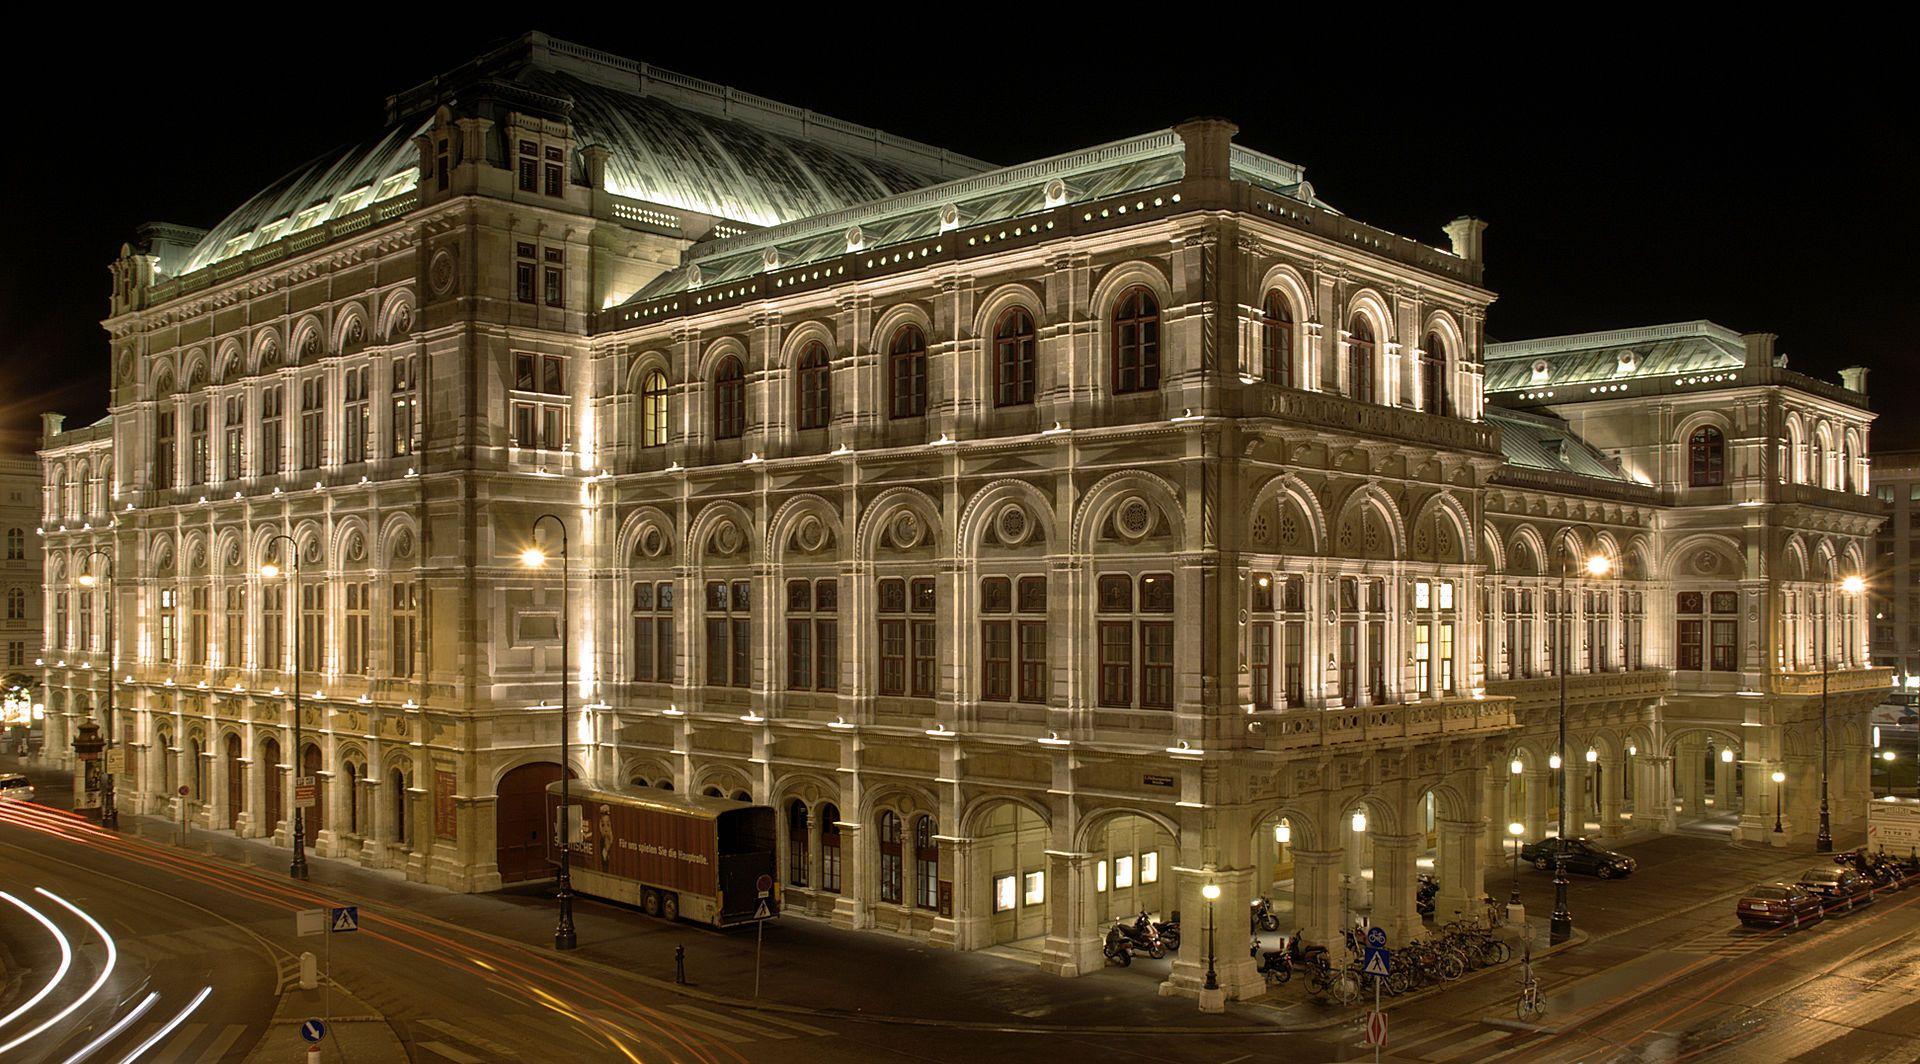 StateOperaViennaNightBackside Vienna State Opera